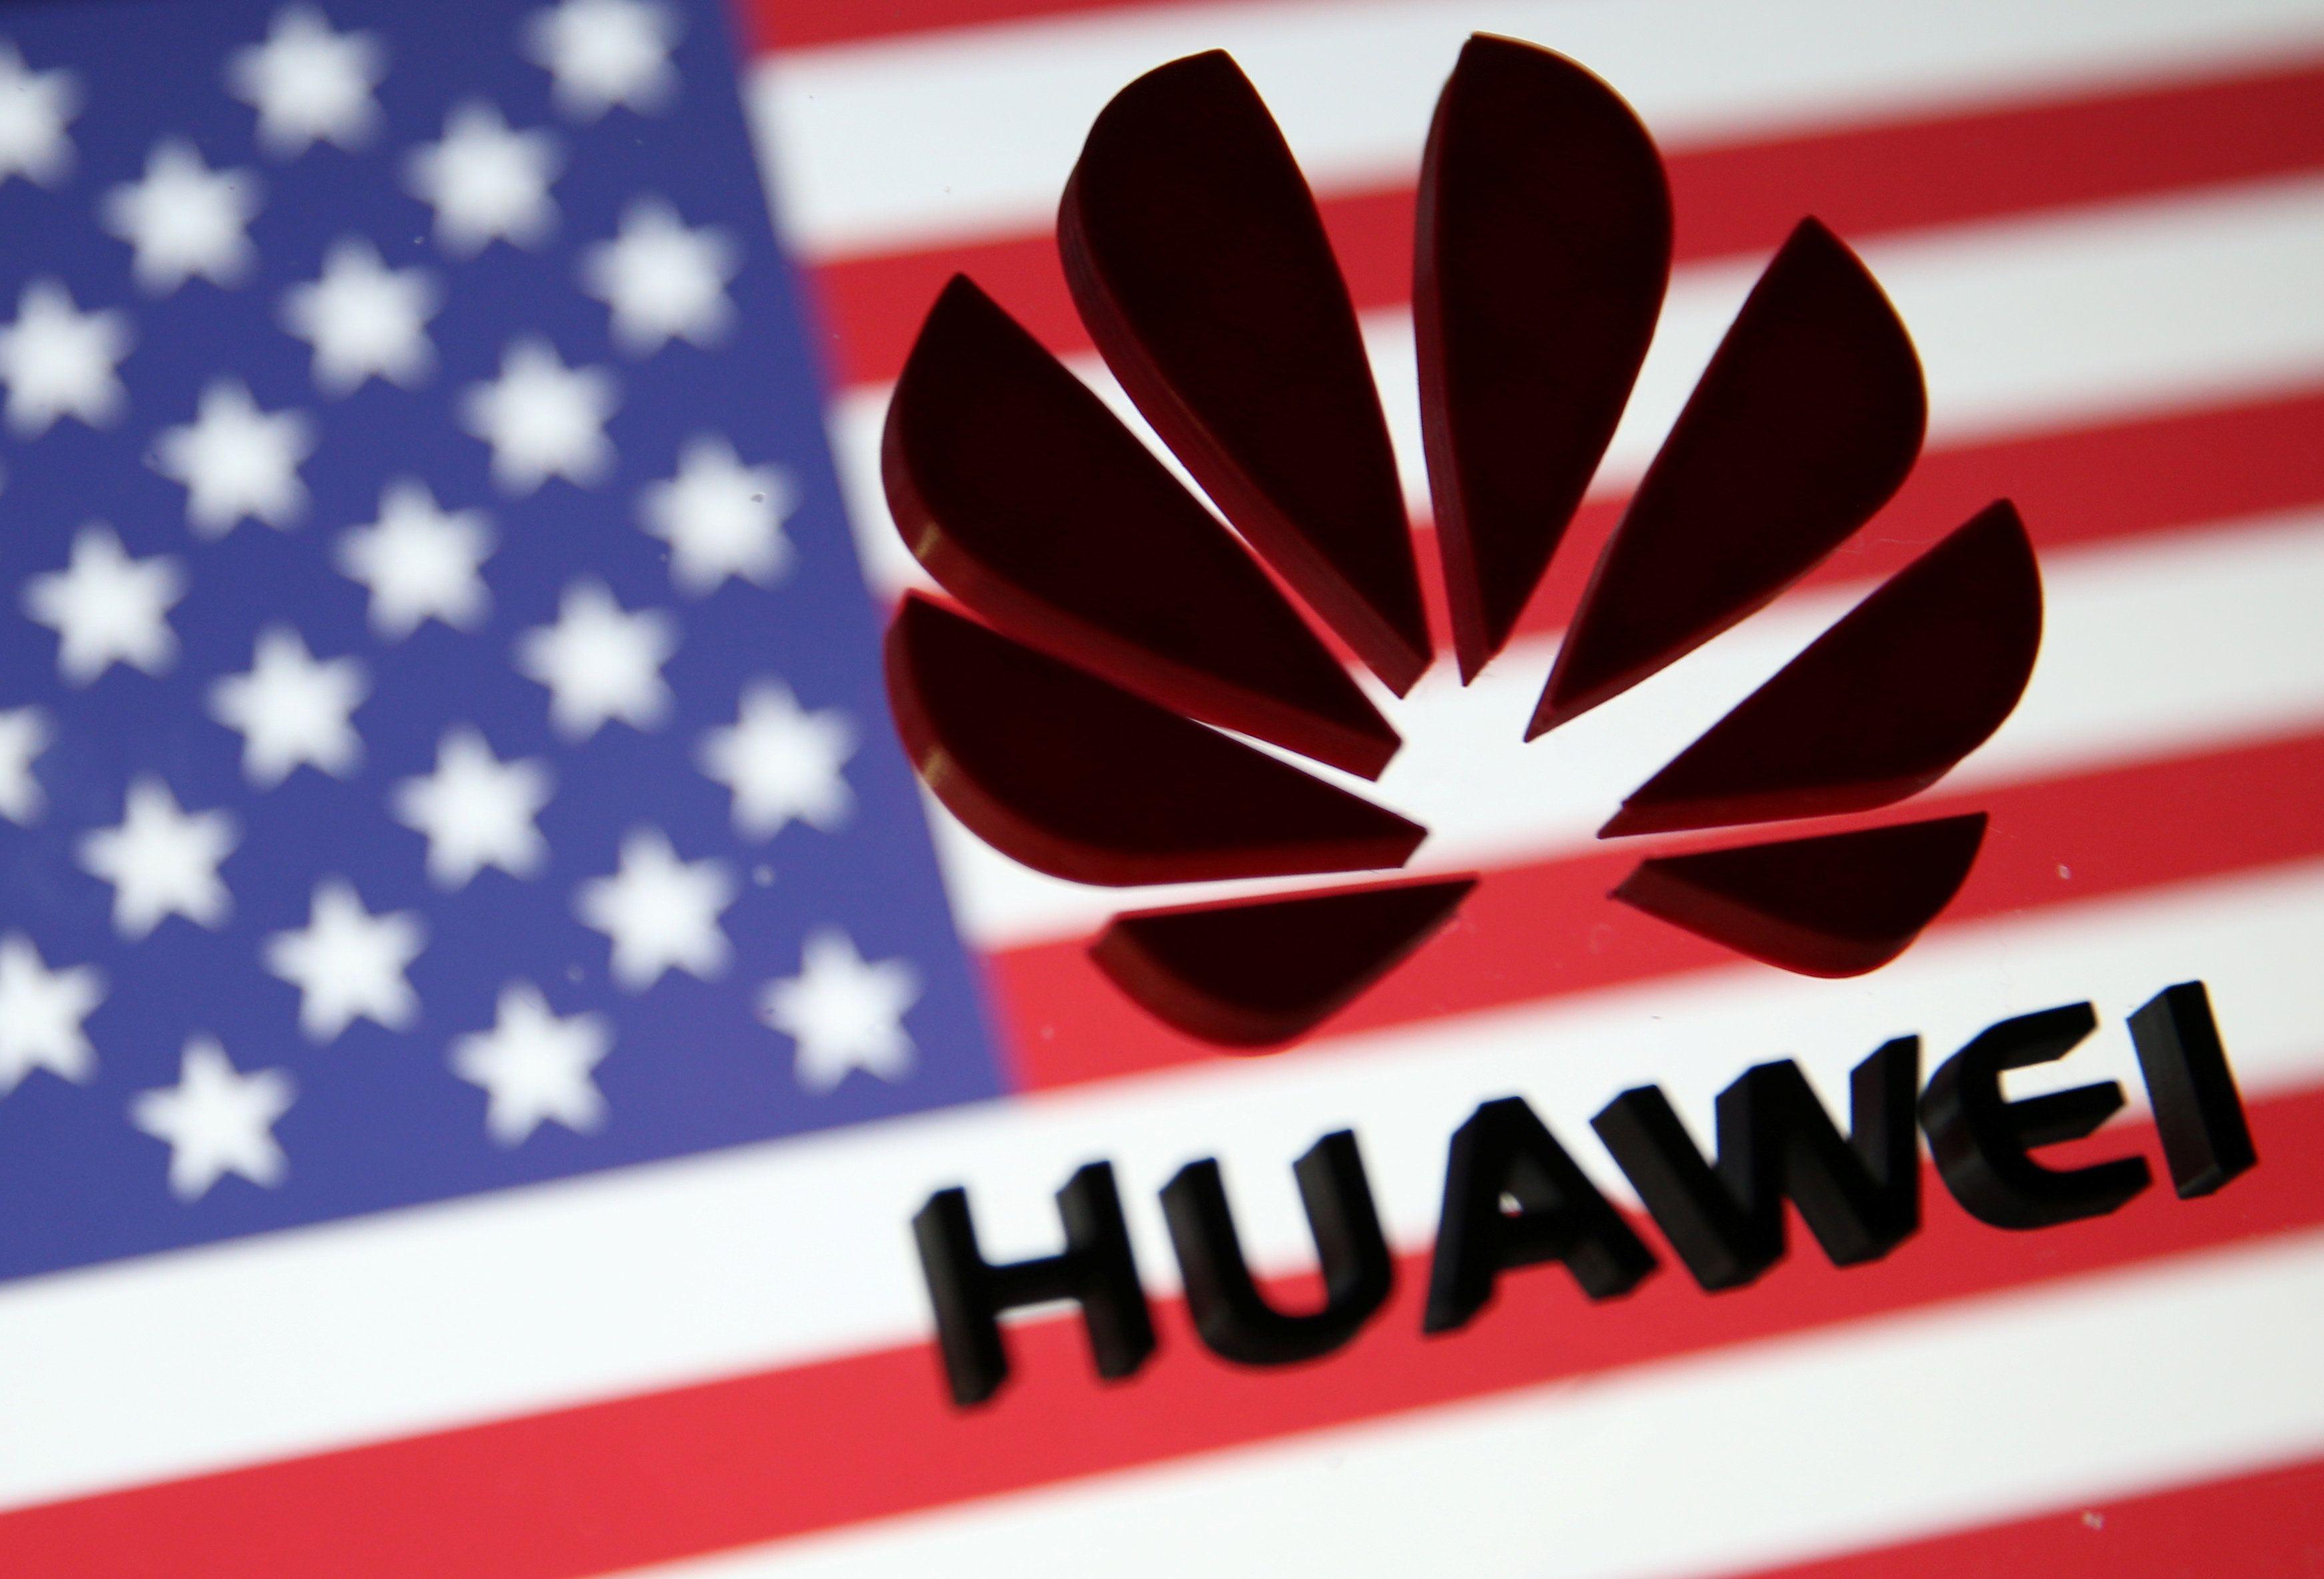 The Huawei Death Threat